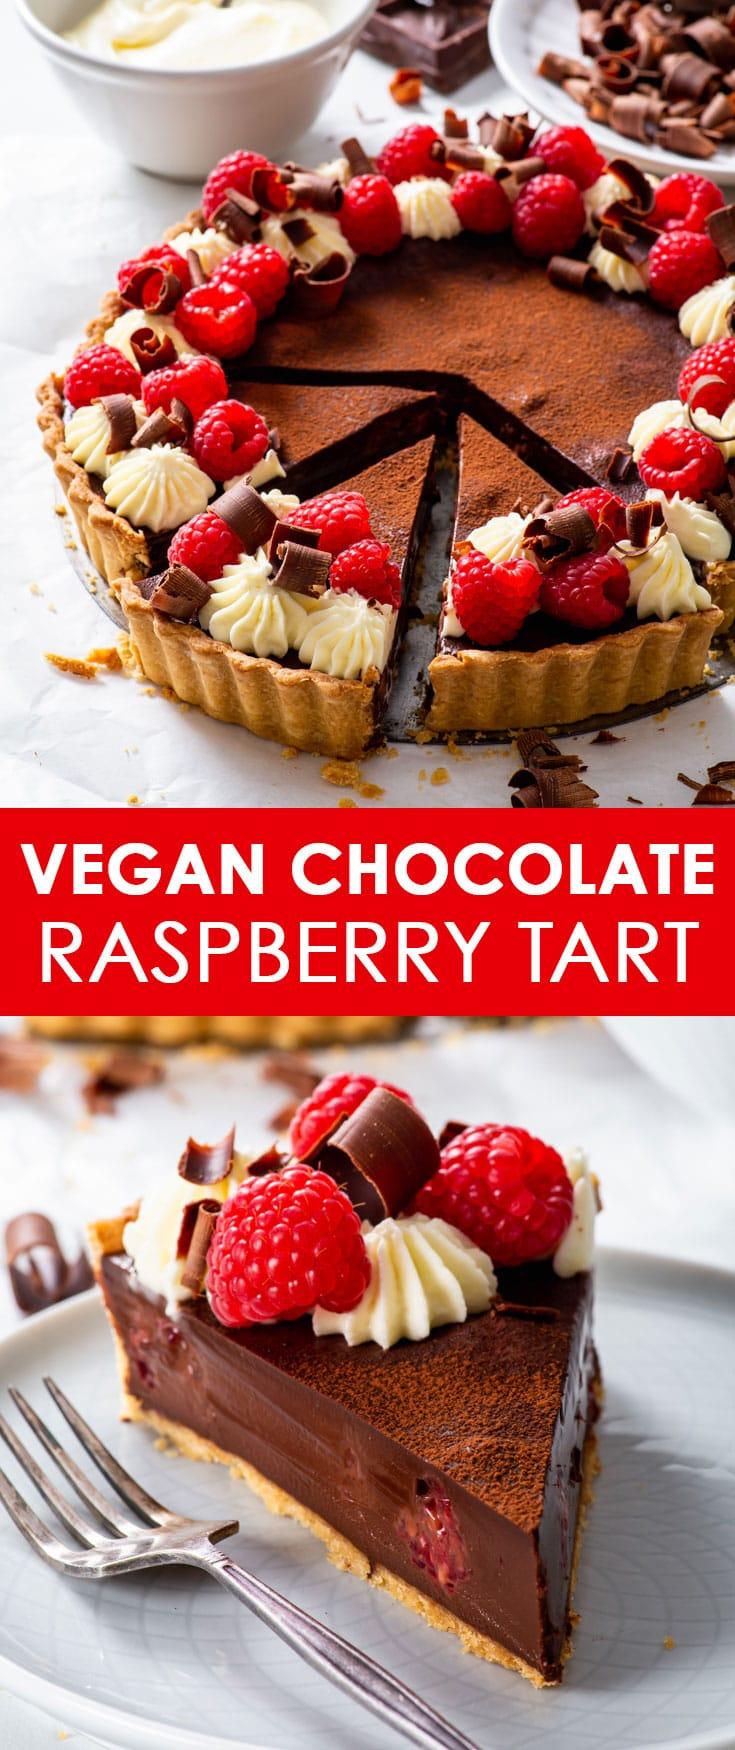 Pinterest image for vegan chocolate & raspberry tart.